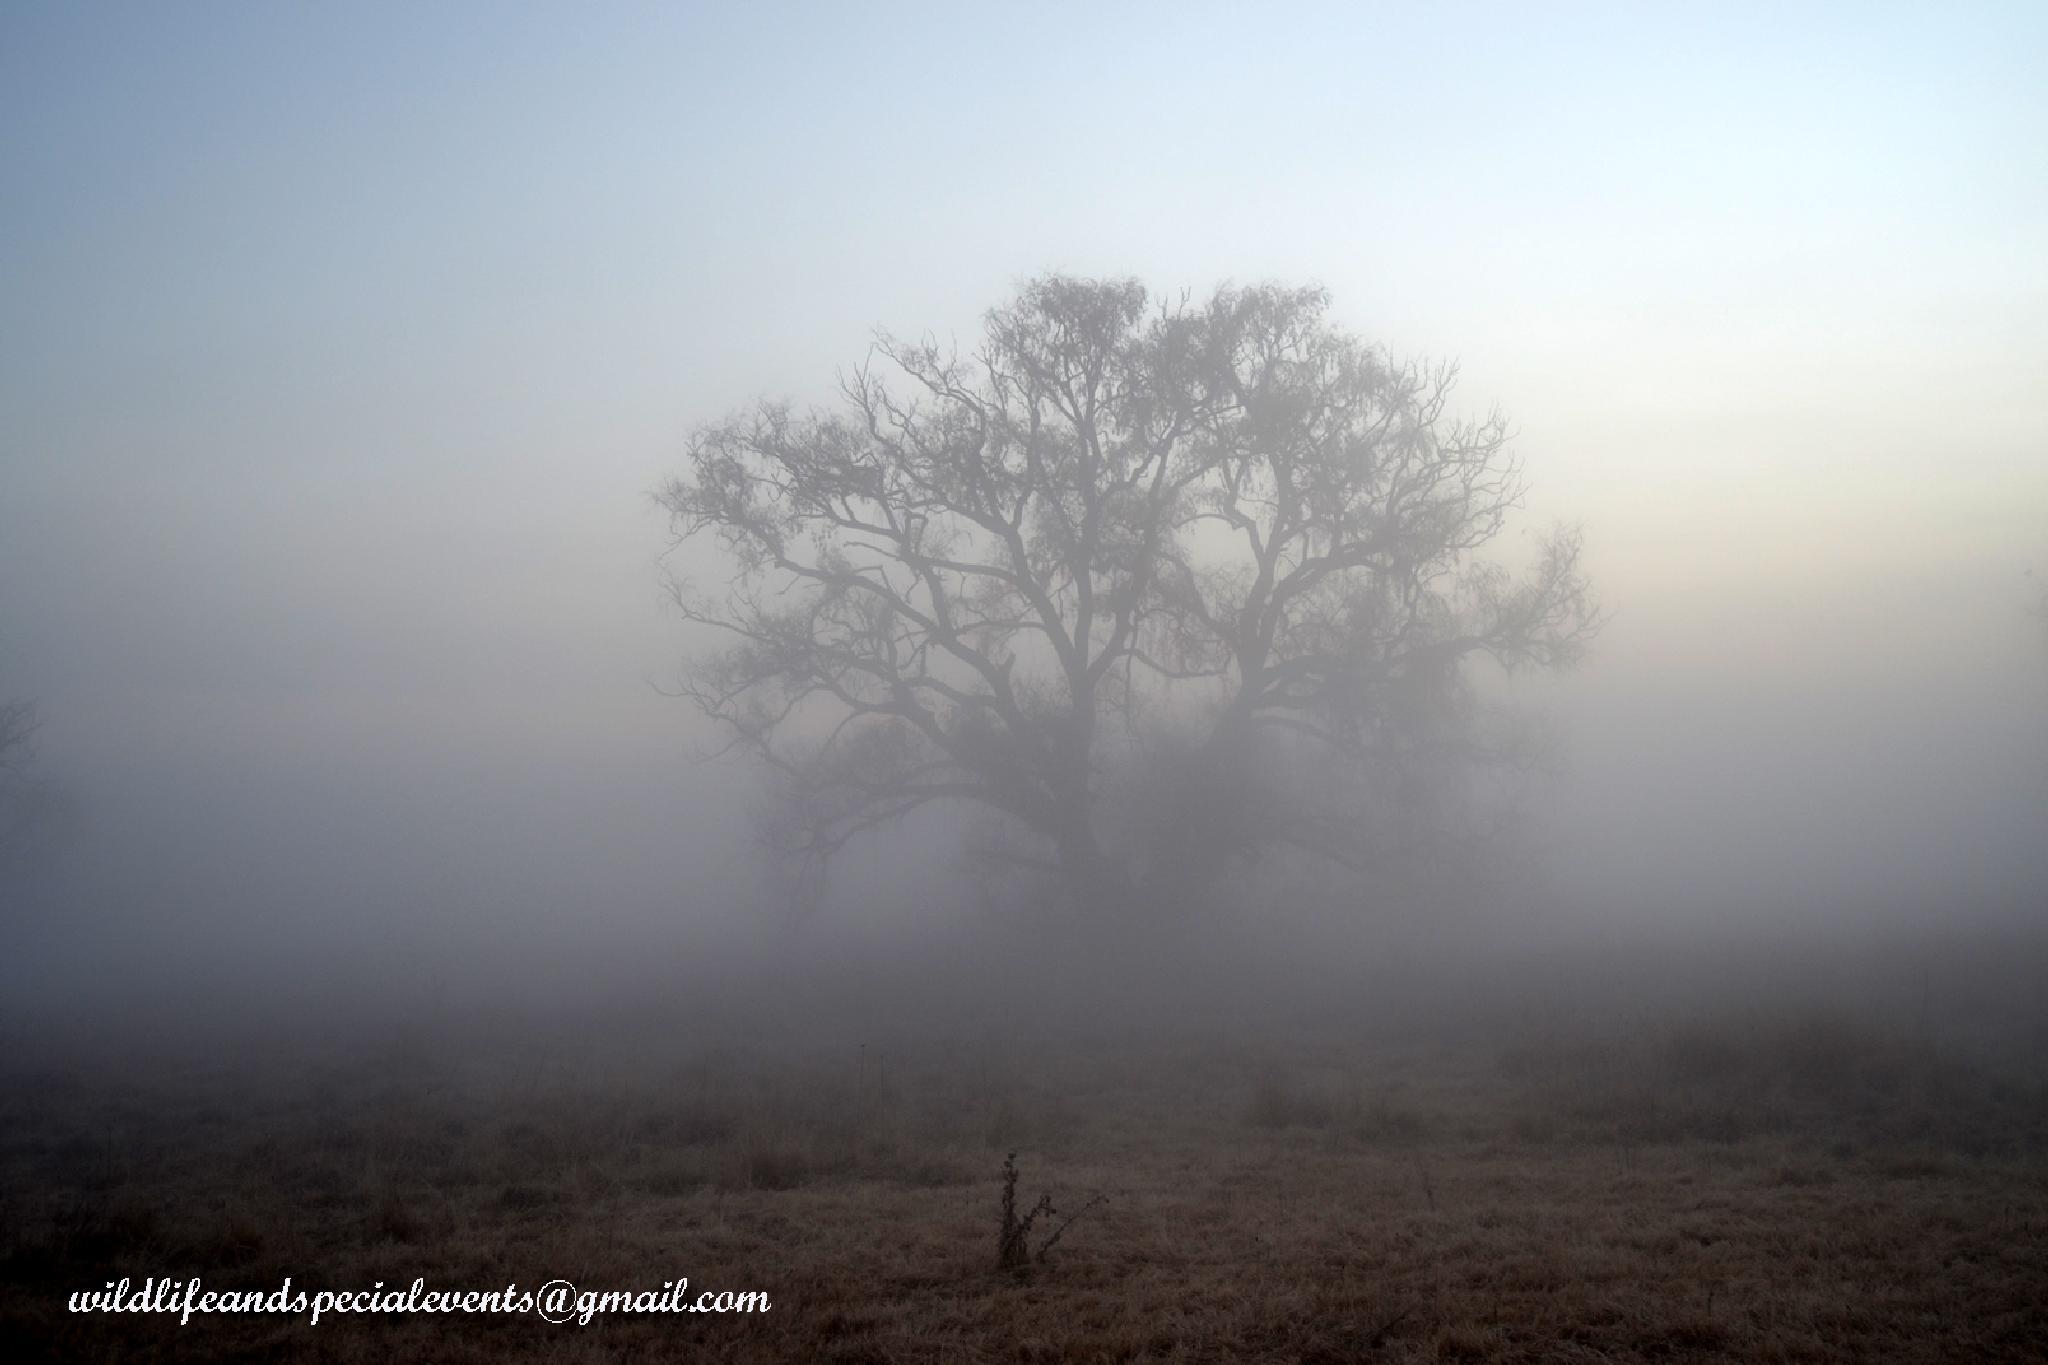 Tree in the mist by oosie